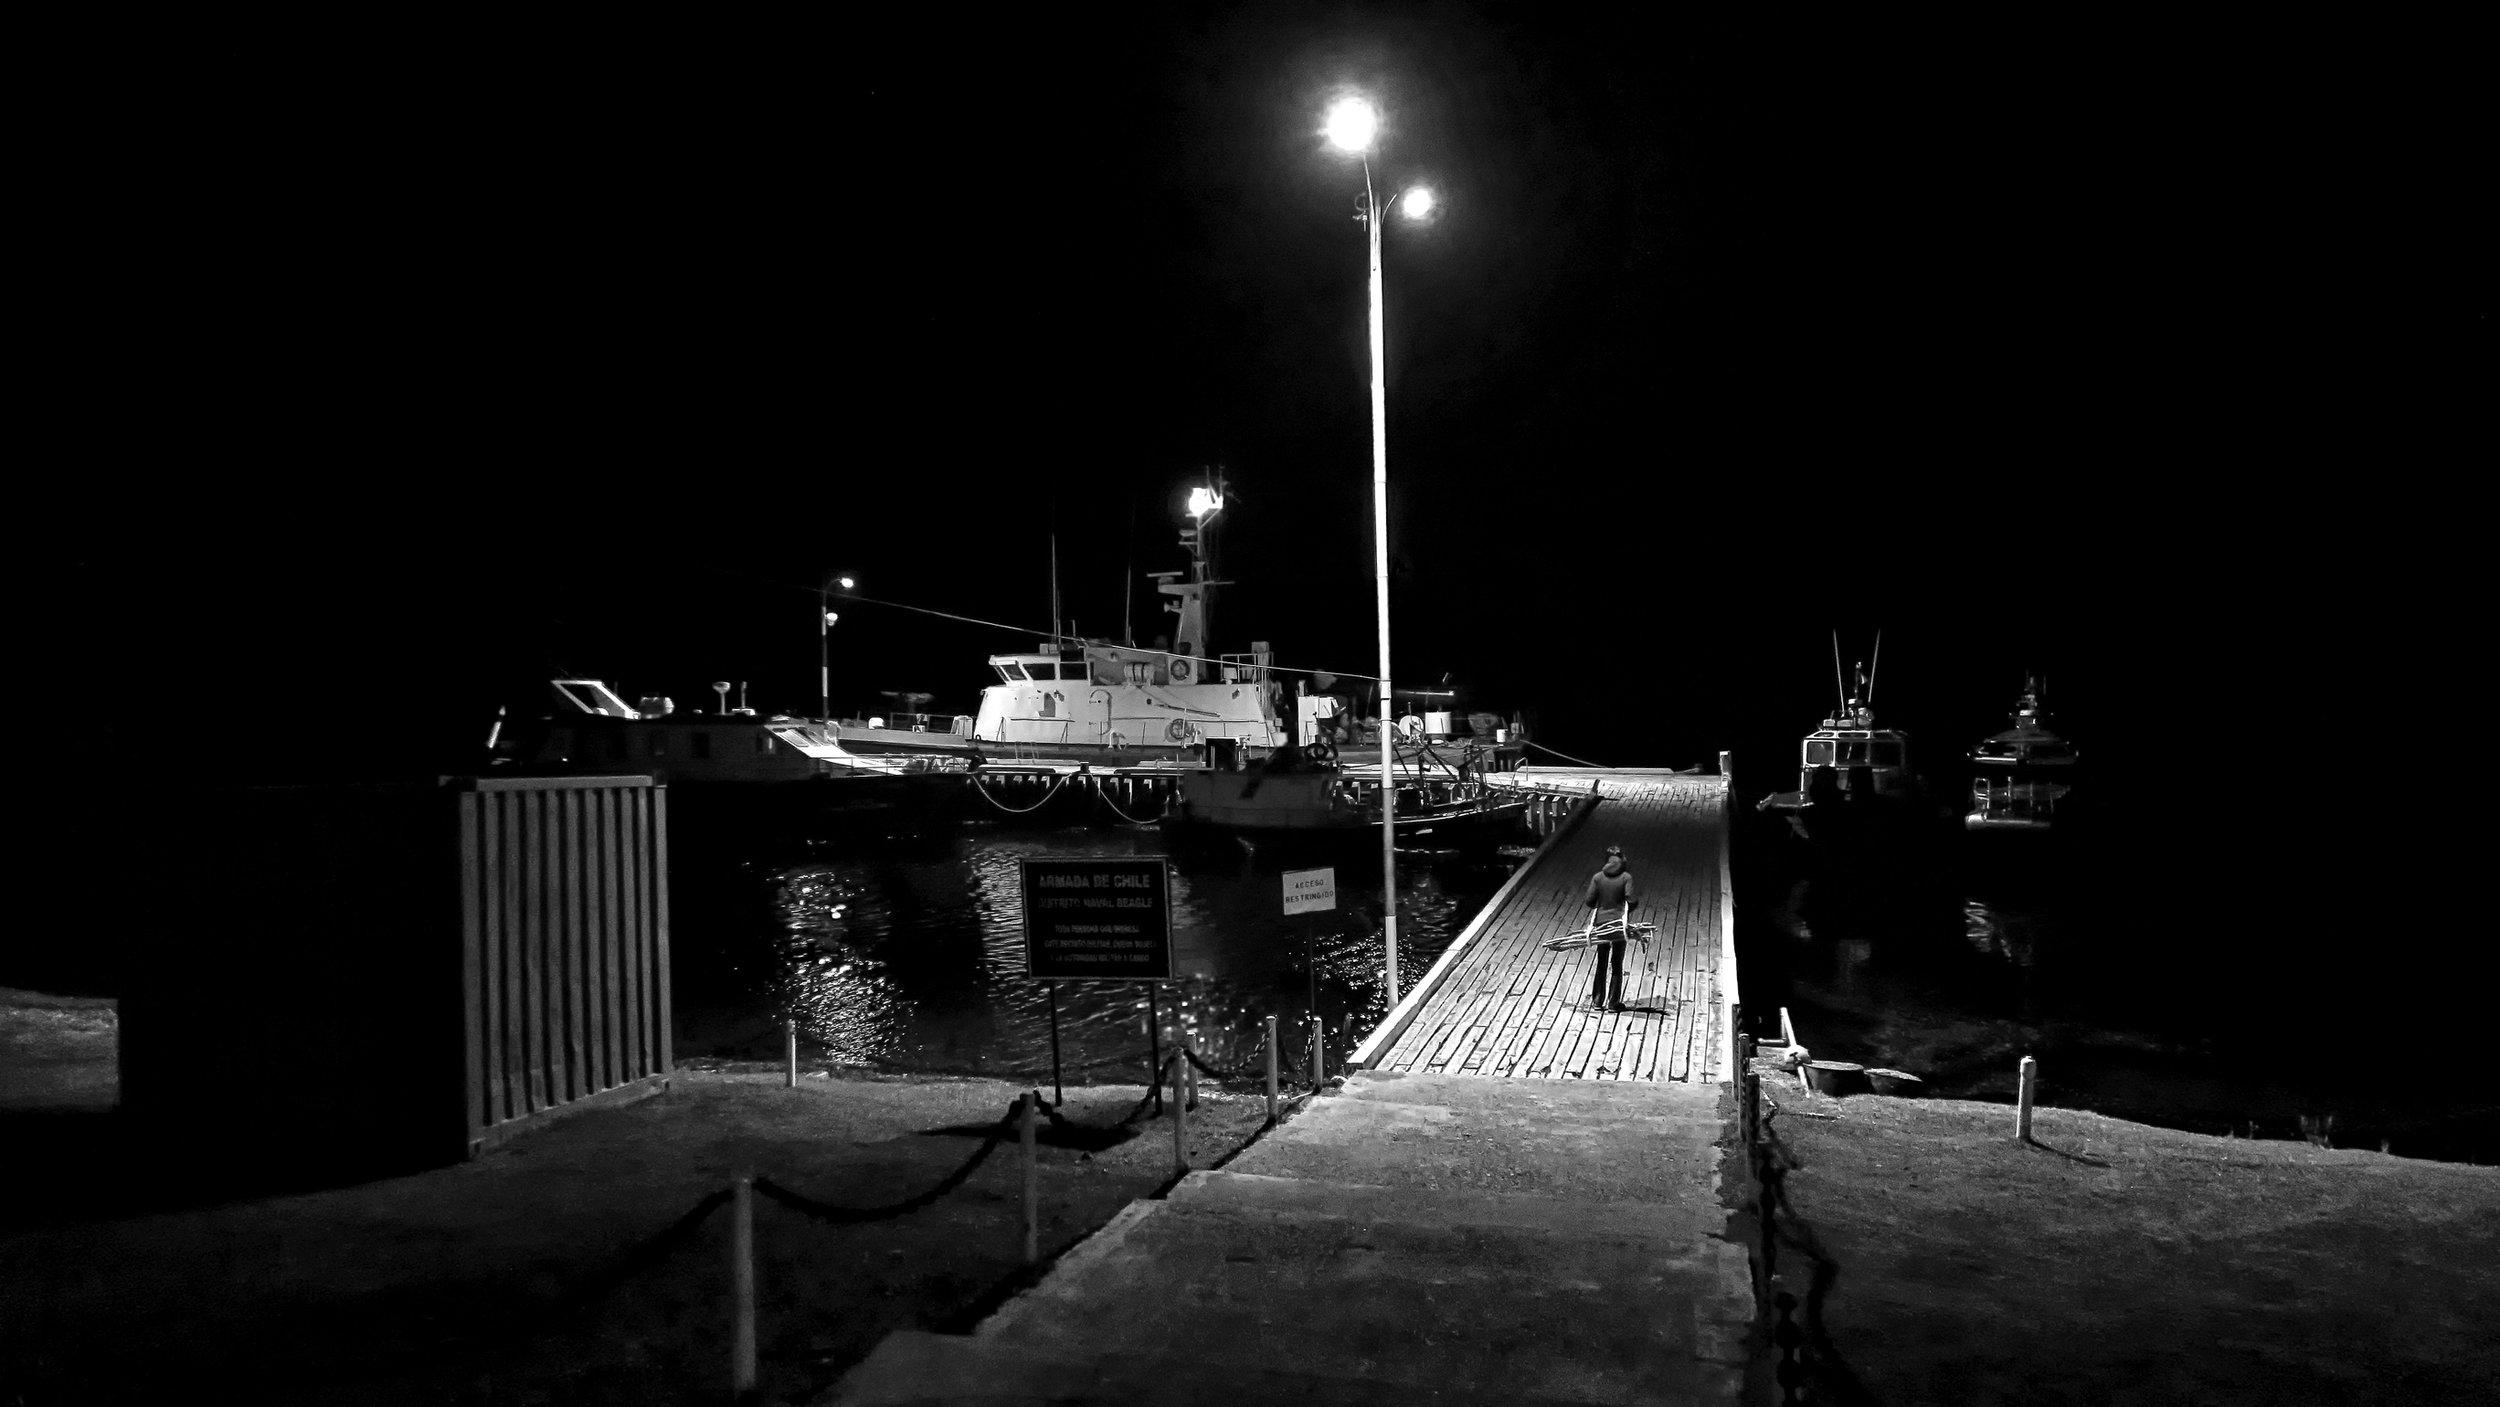 Más Afuera,  2015.  Performance, isla Navarino. Impresión Lambda. 80 x 120 cm.     Further Out, 2015. Performance, Navarino Island. Lambda print. 80 x 120 cm.